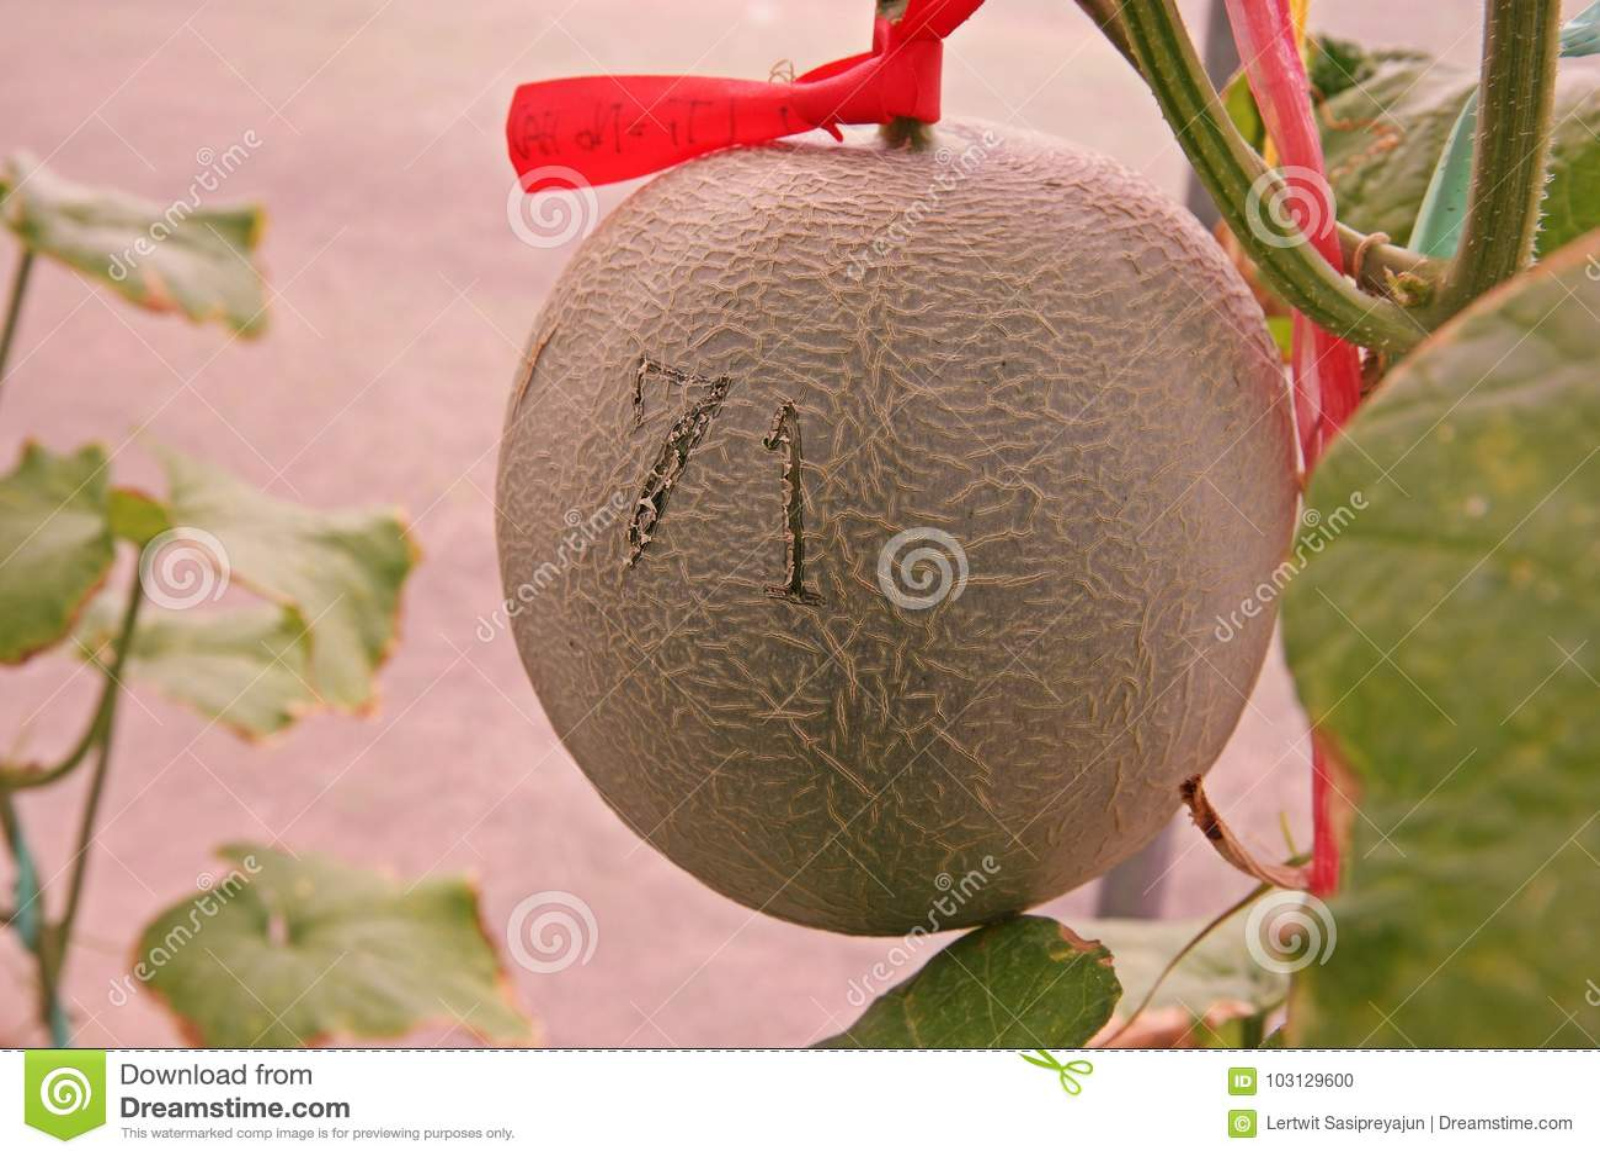 Kantalup lub muskmelon, owocowa Cucurbitaceae rodzina